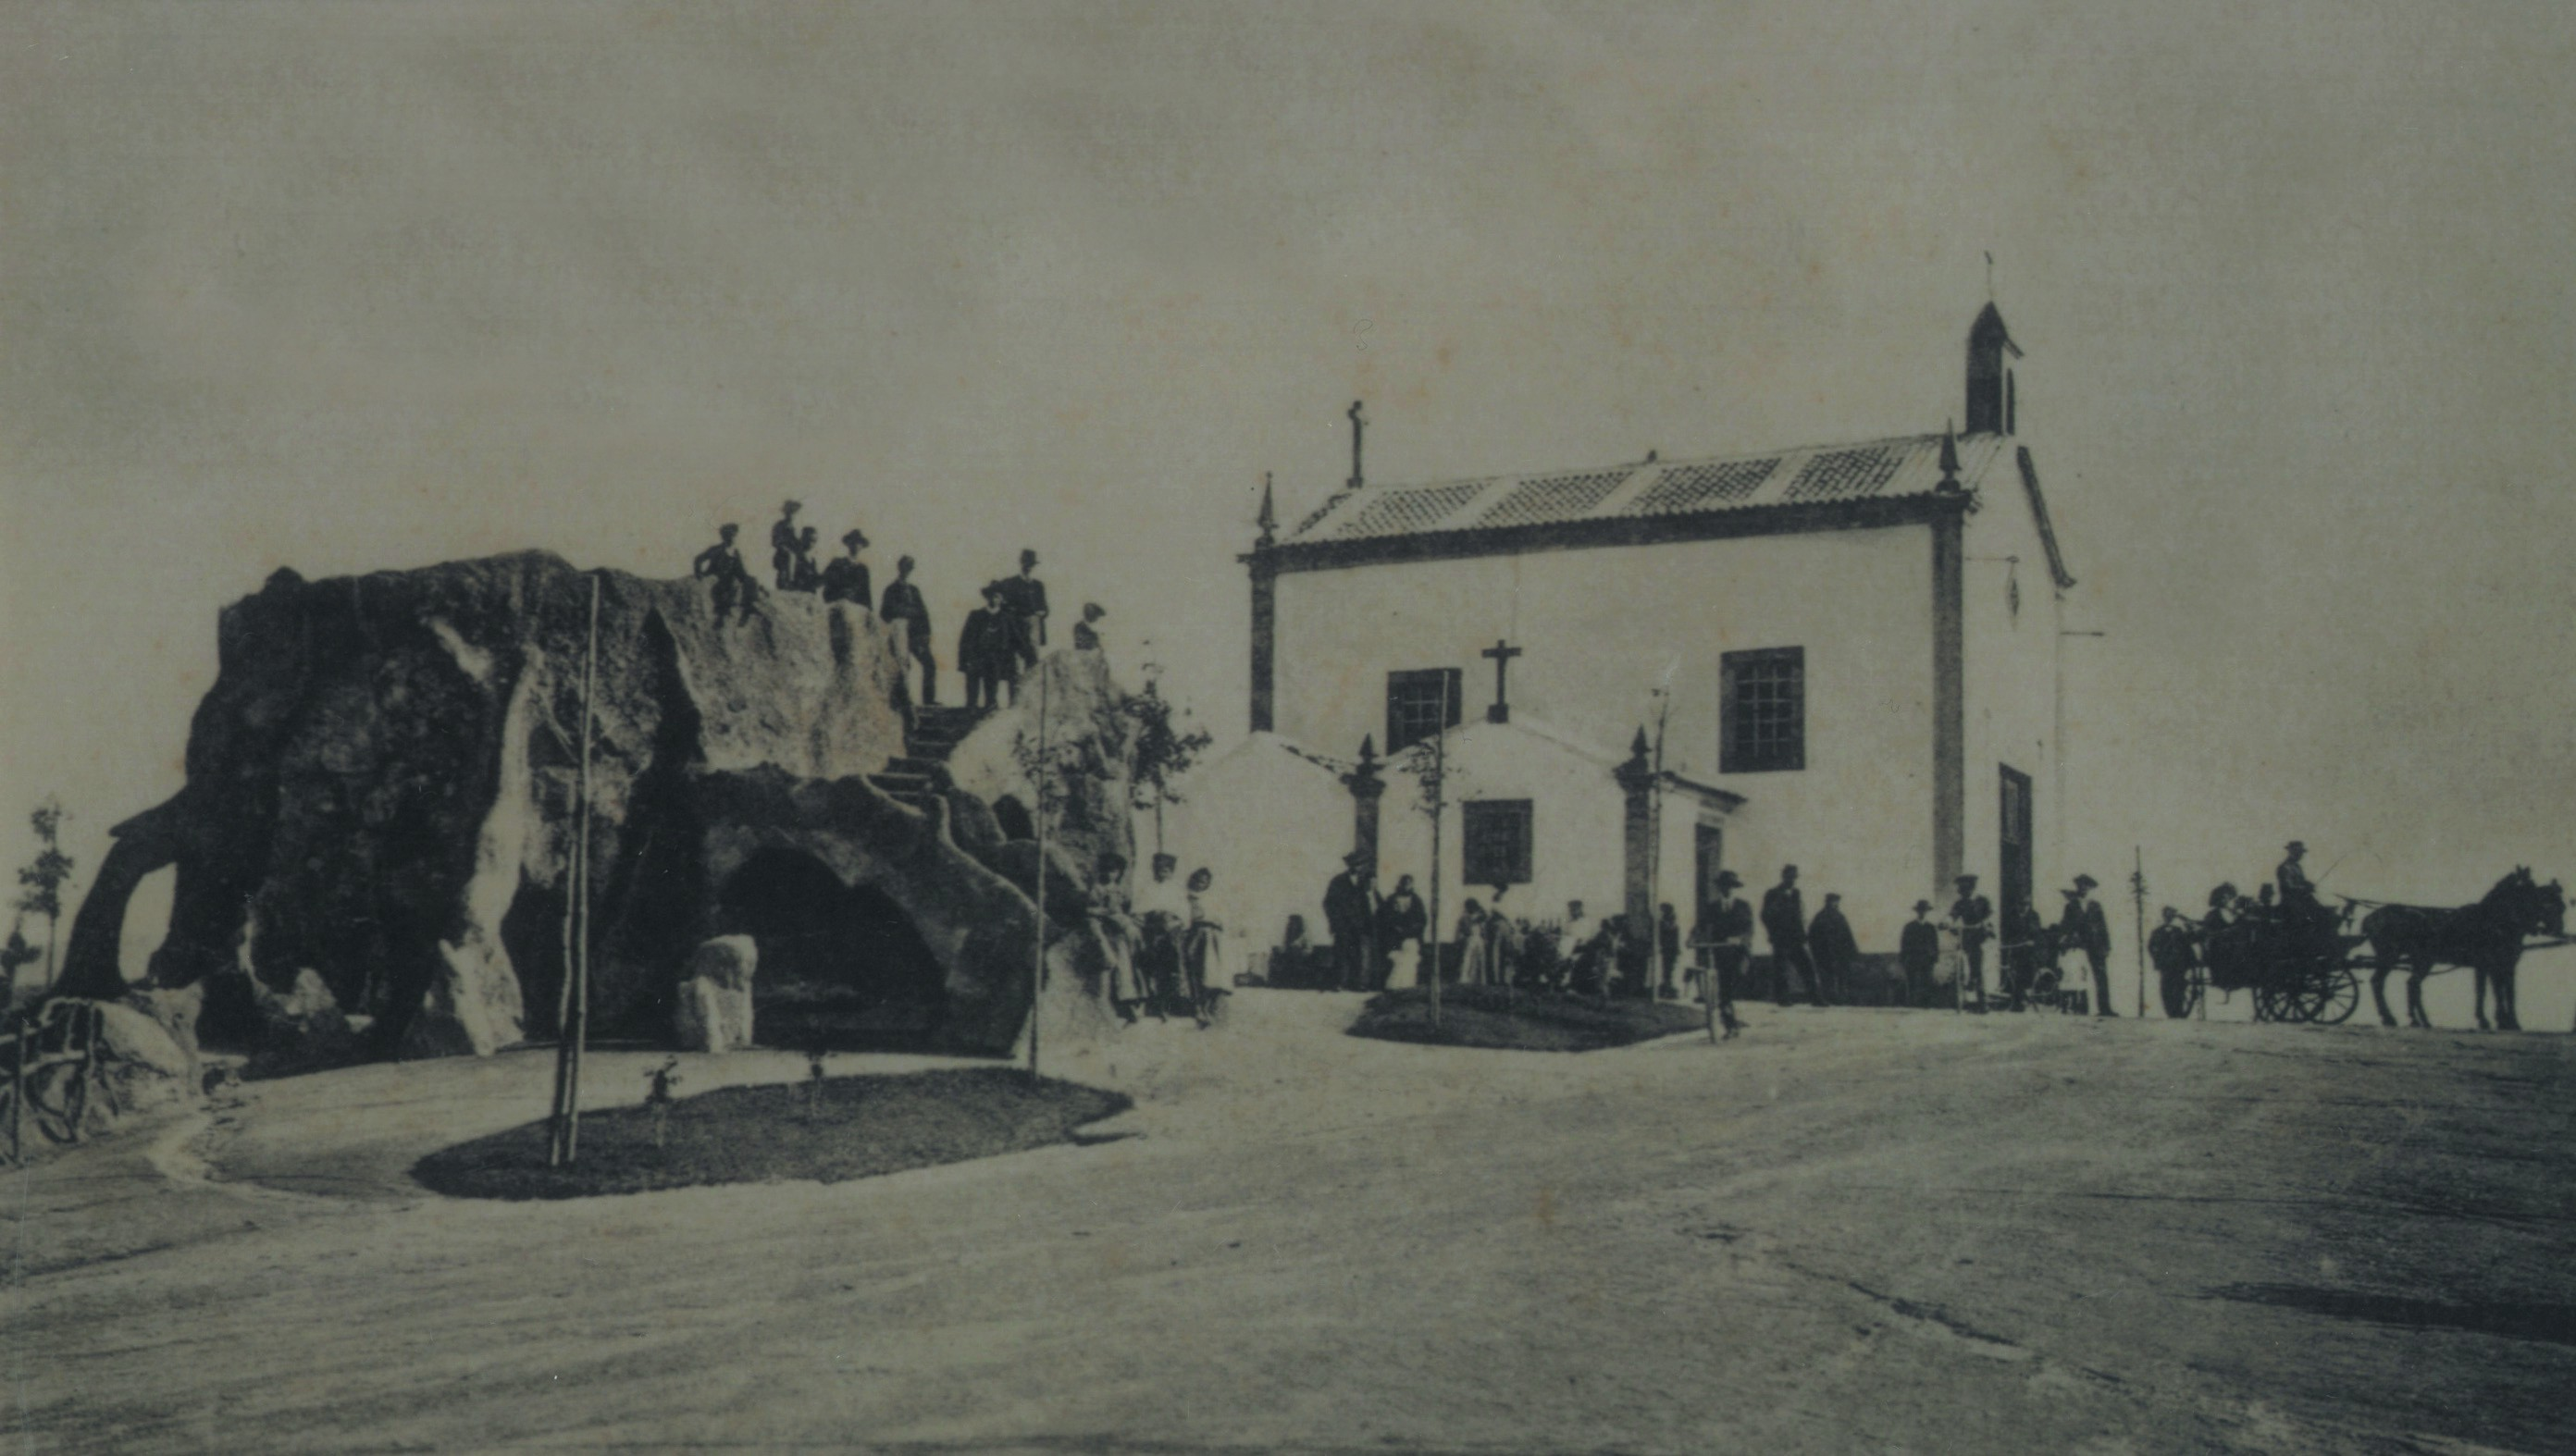 Parque de La Salette, gruta e ermida (Anos 10)